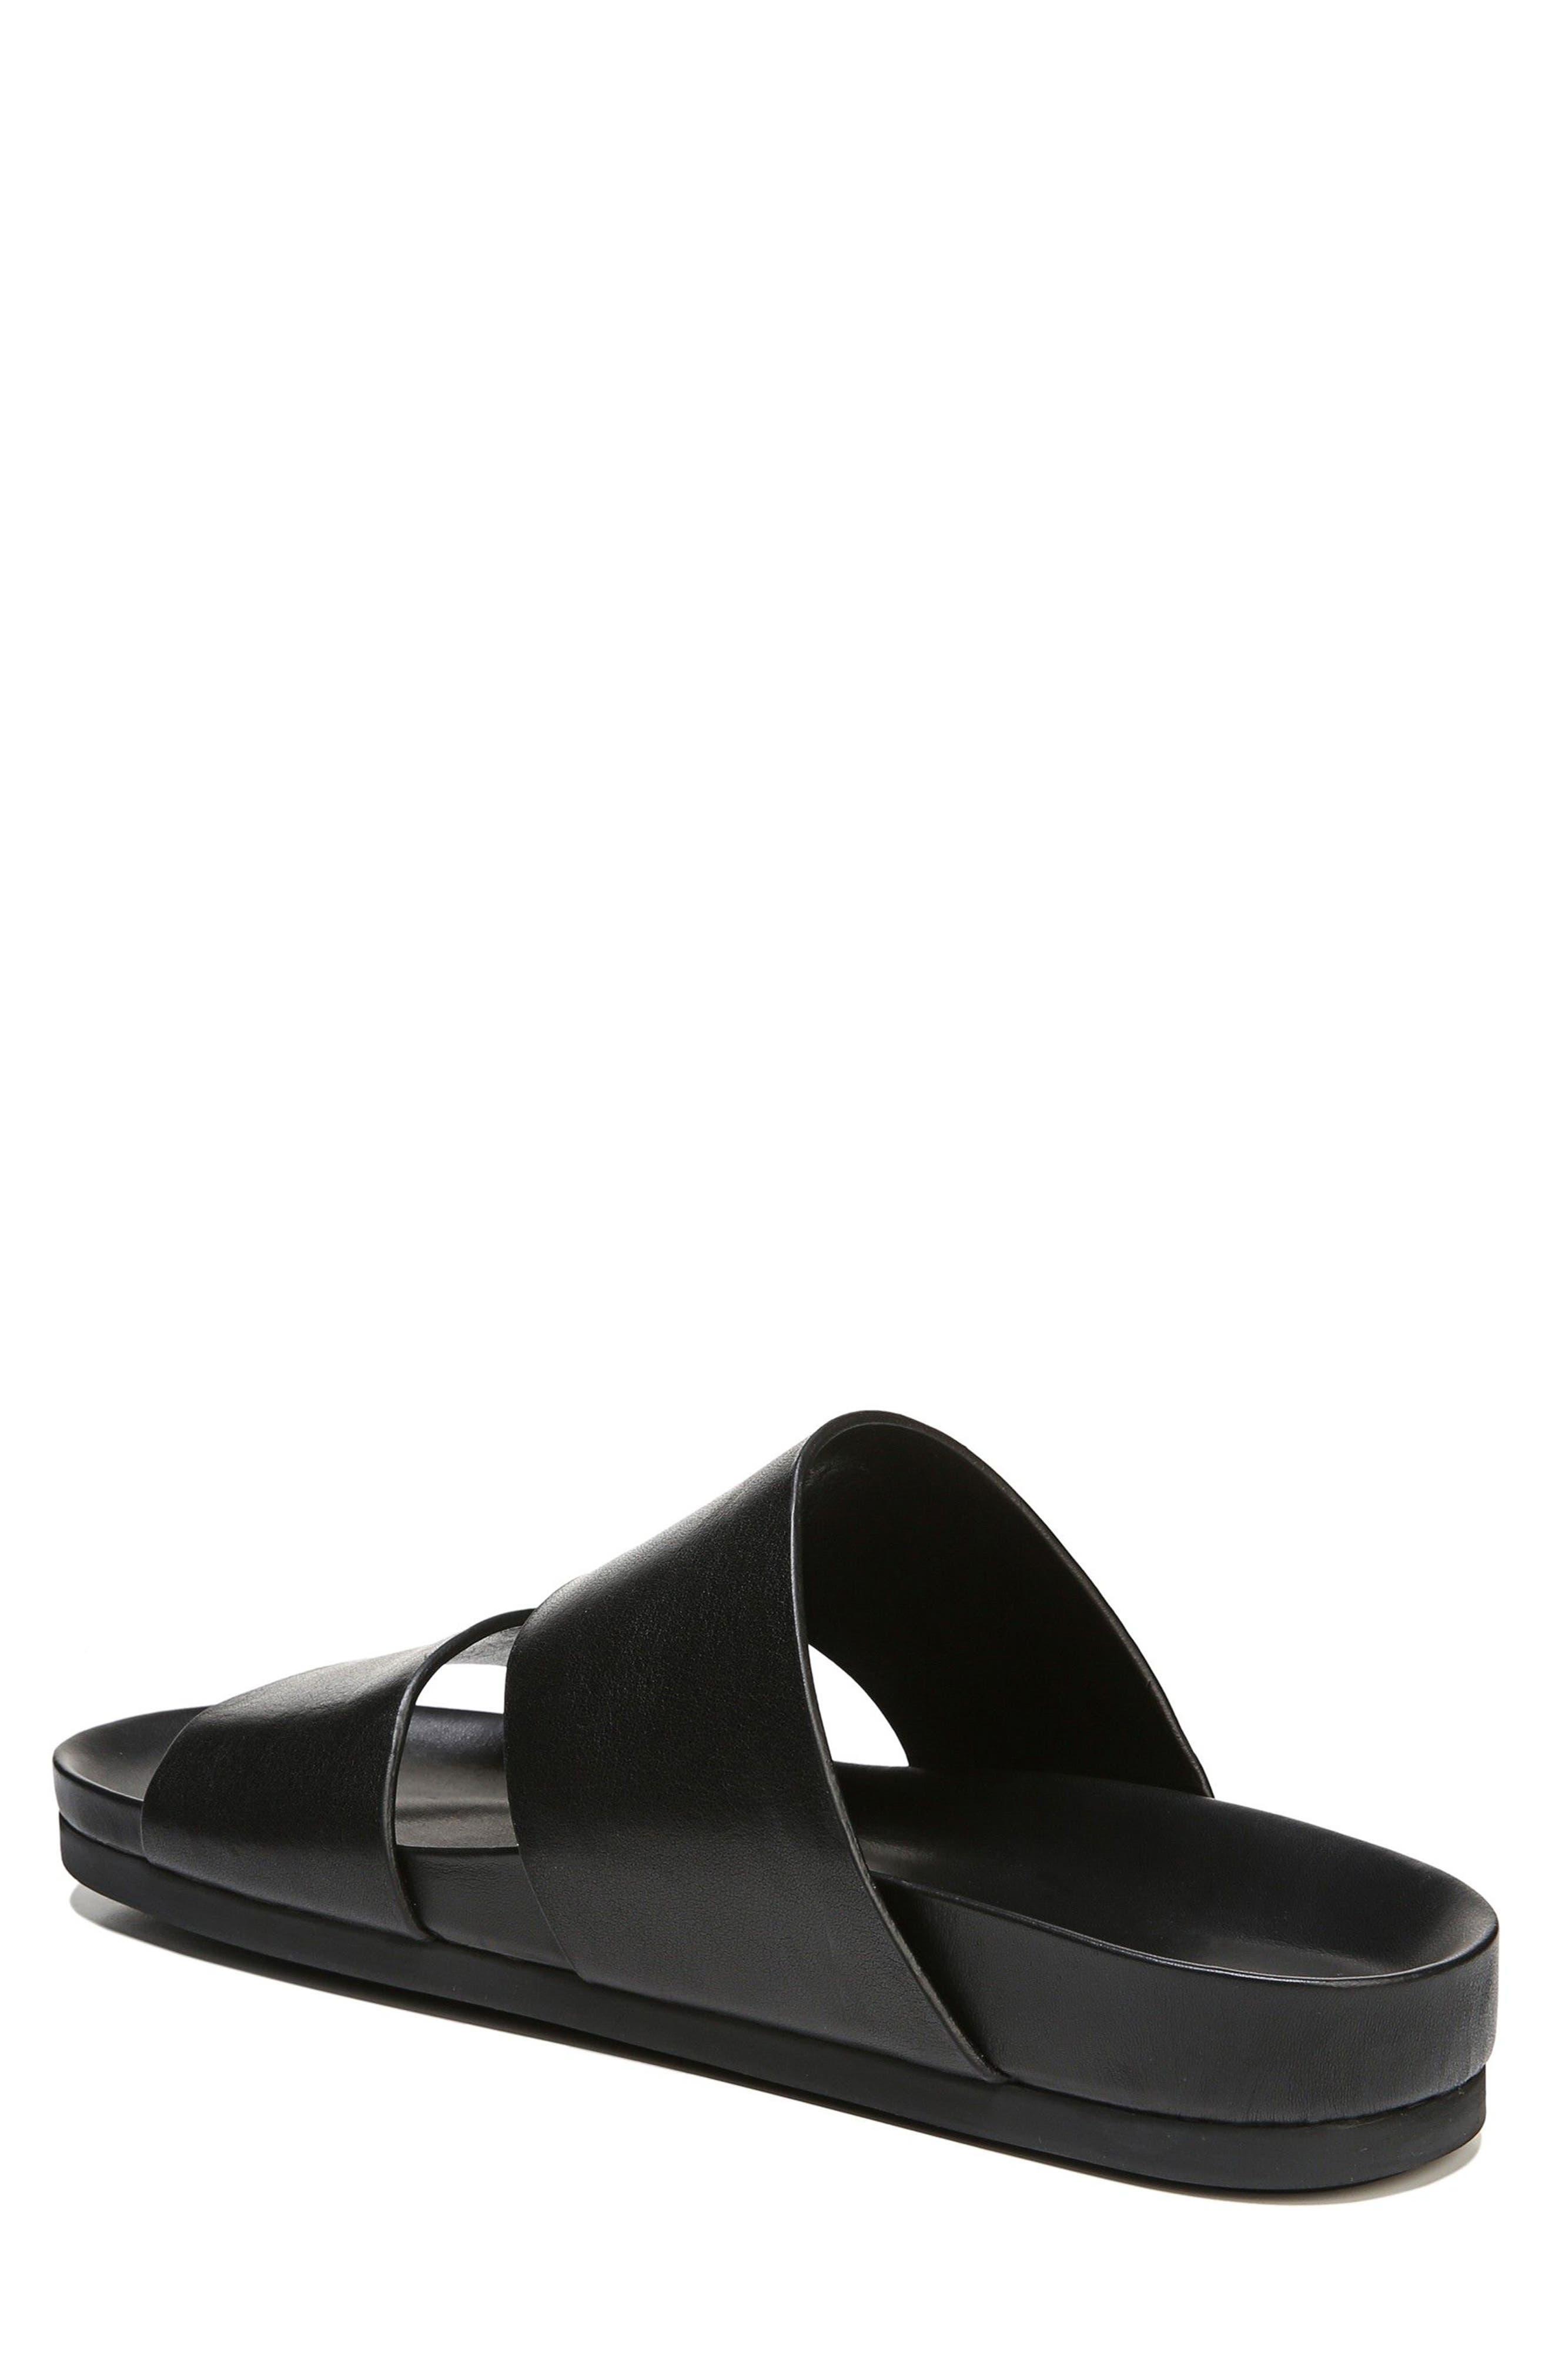 Malibu Slide Sandal,                             Alternate thumbnail 2, color,                             Black